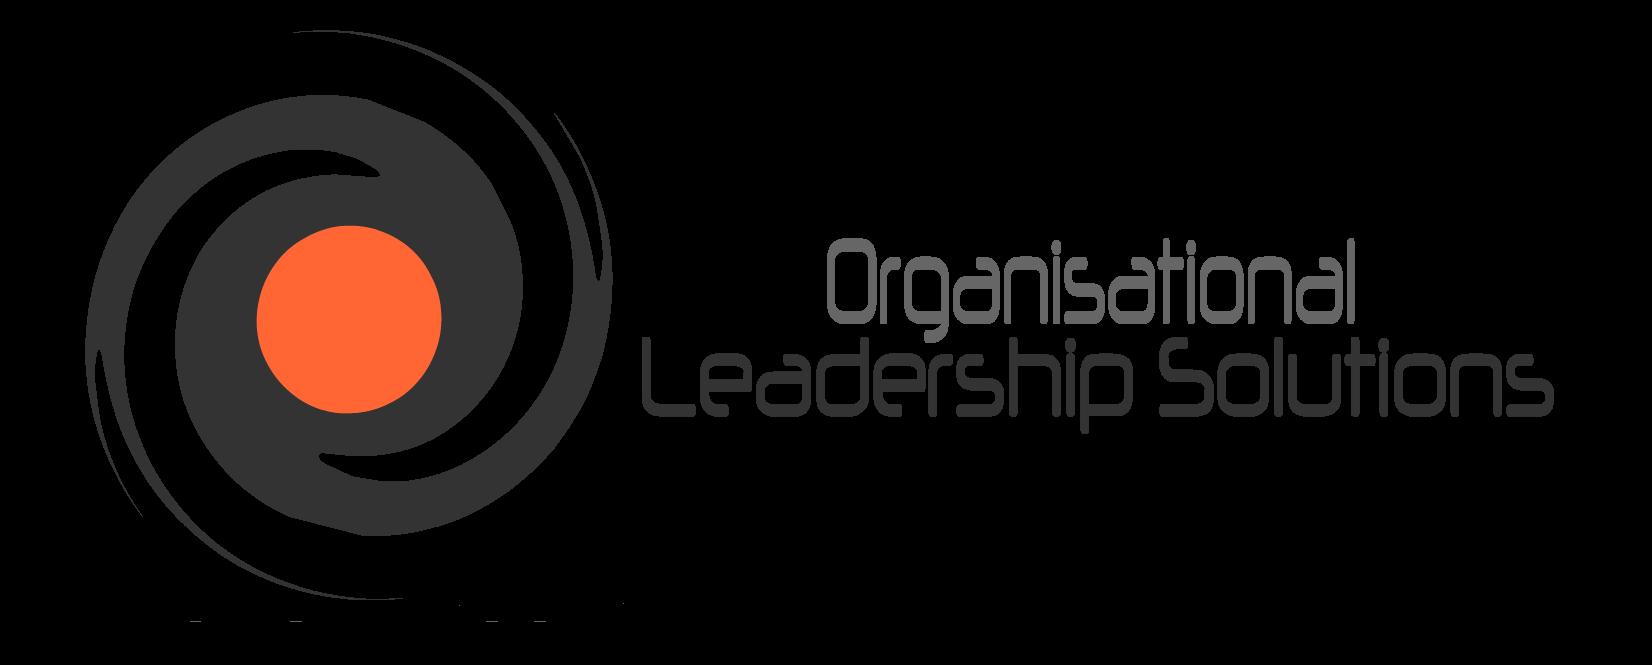 Organisational leadership Solutions